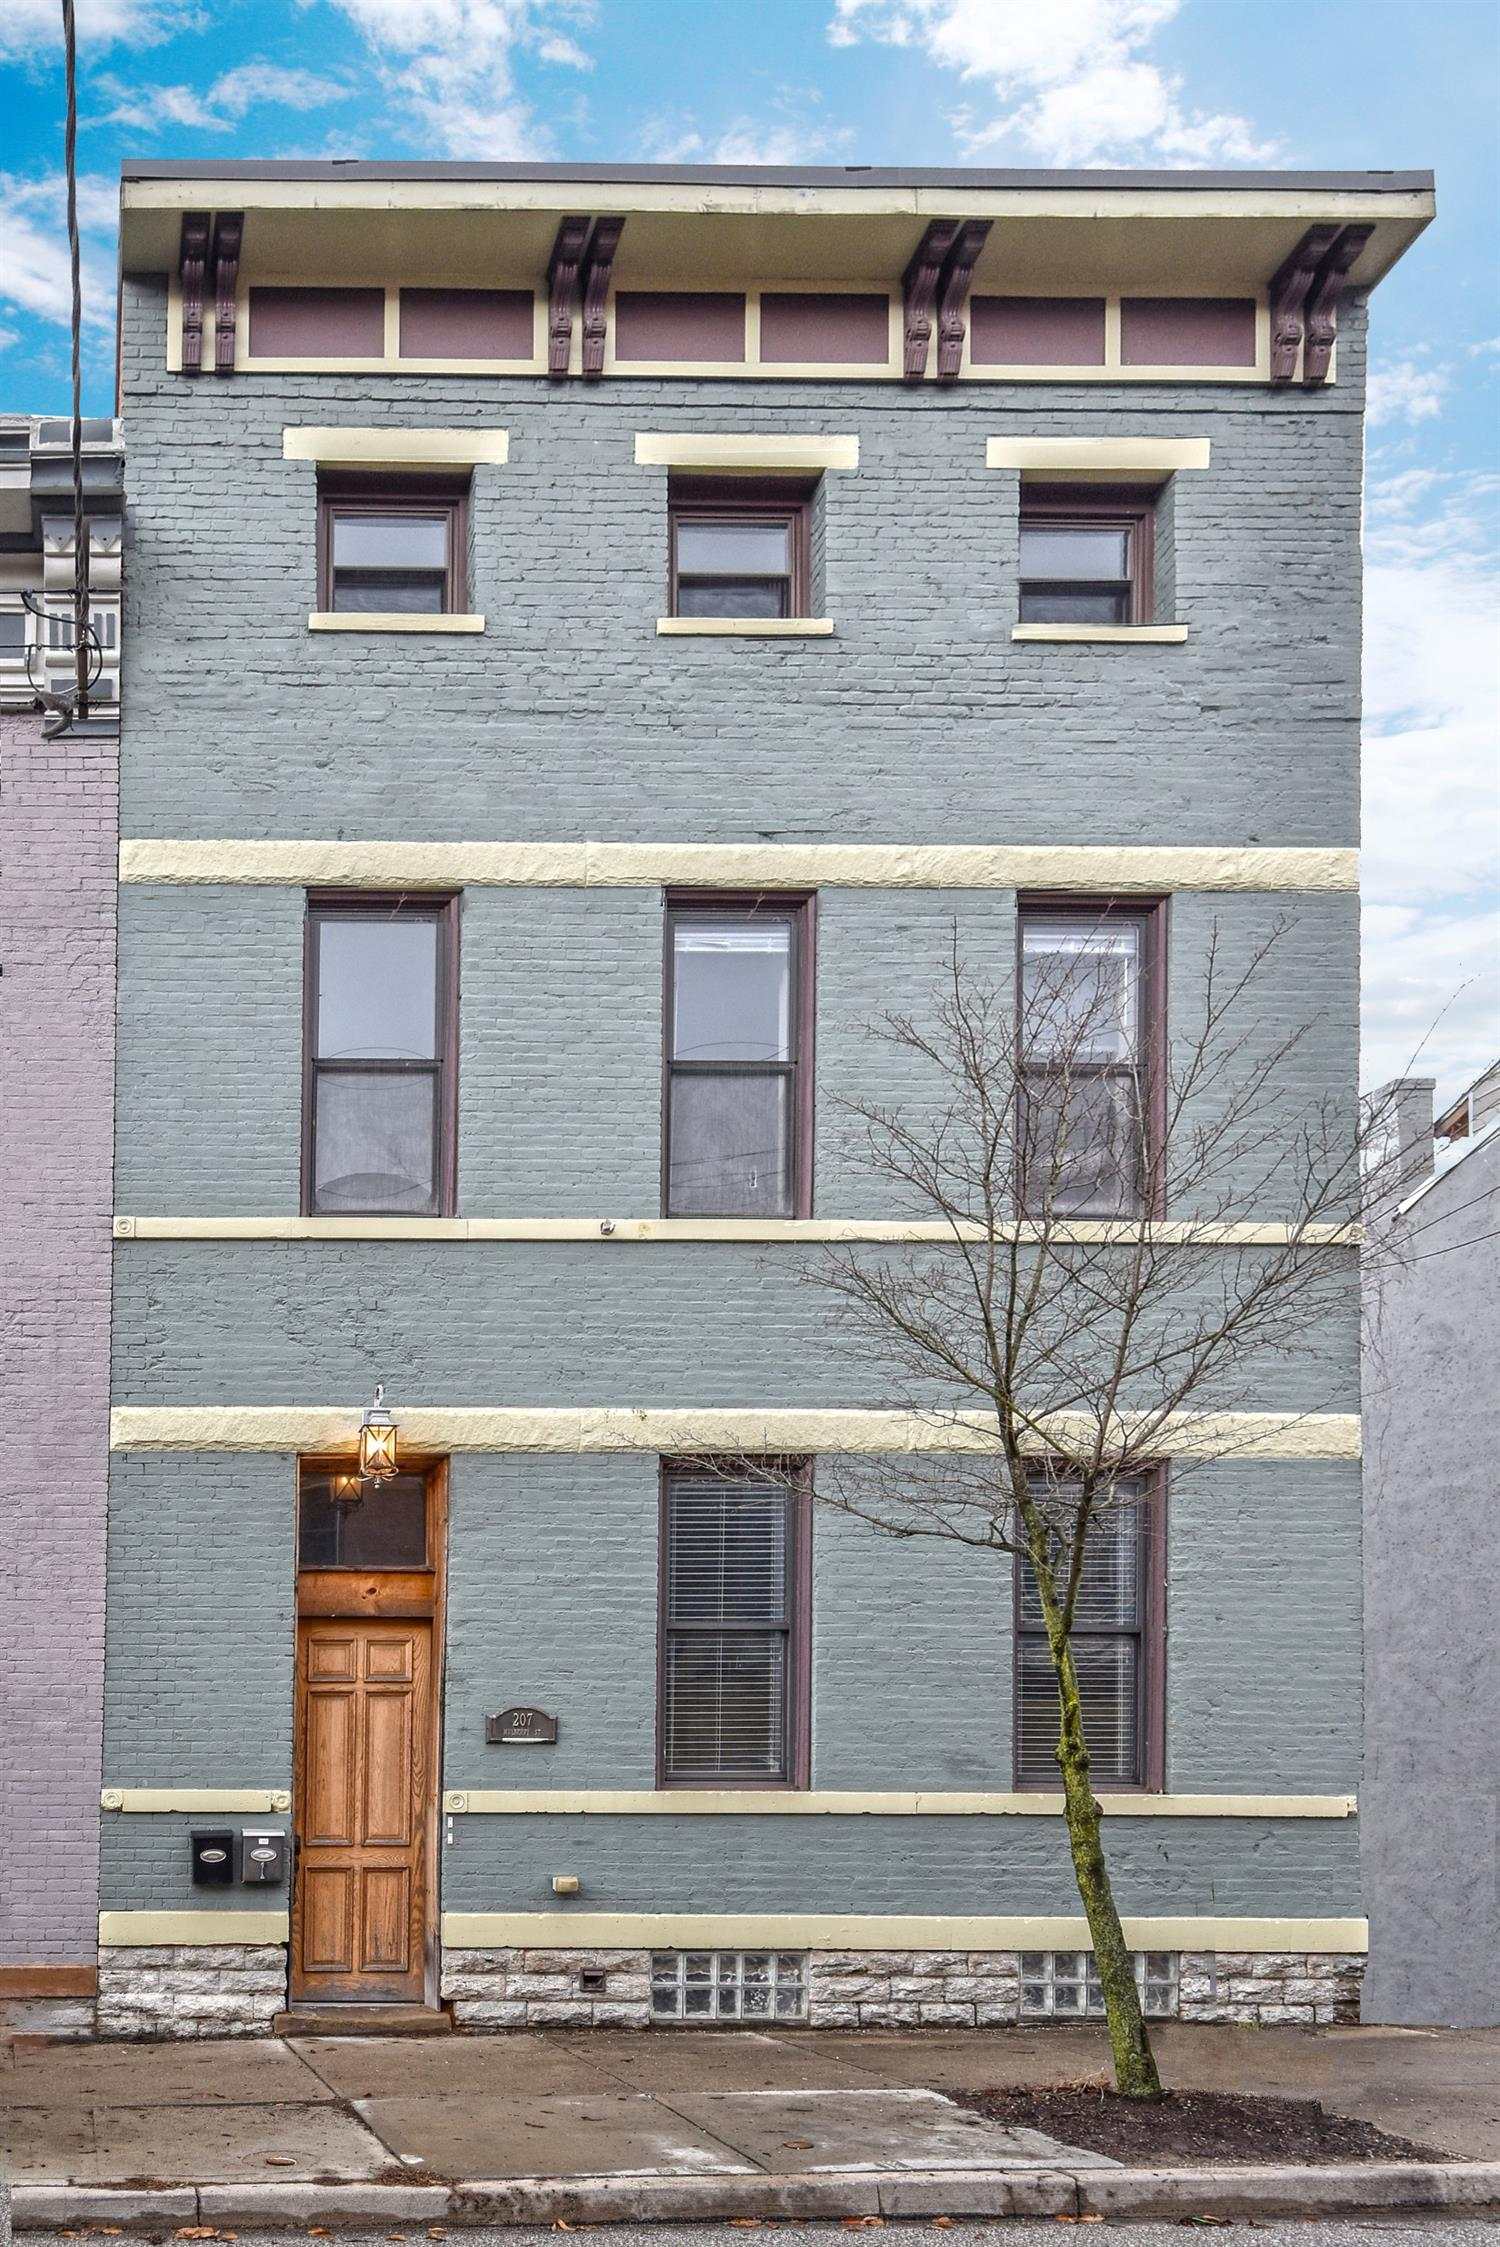 Property for sale at 207 Mulberry Street, Cincinnati,  Ohio 45202